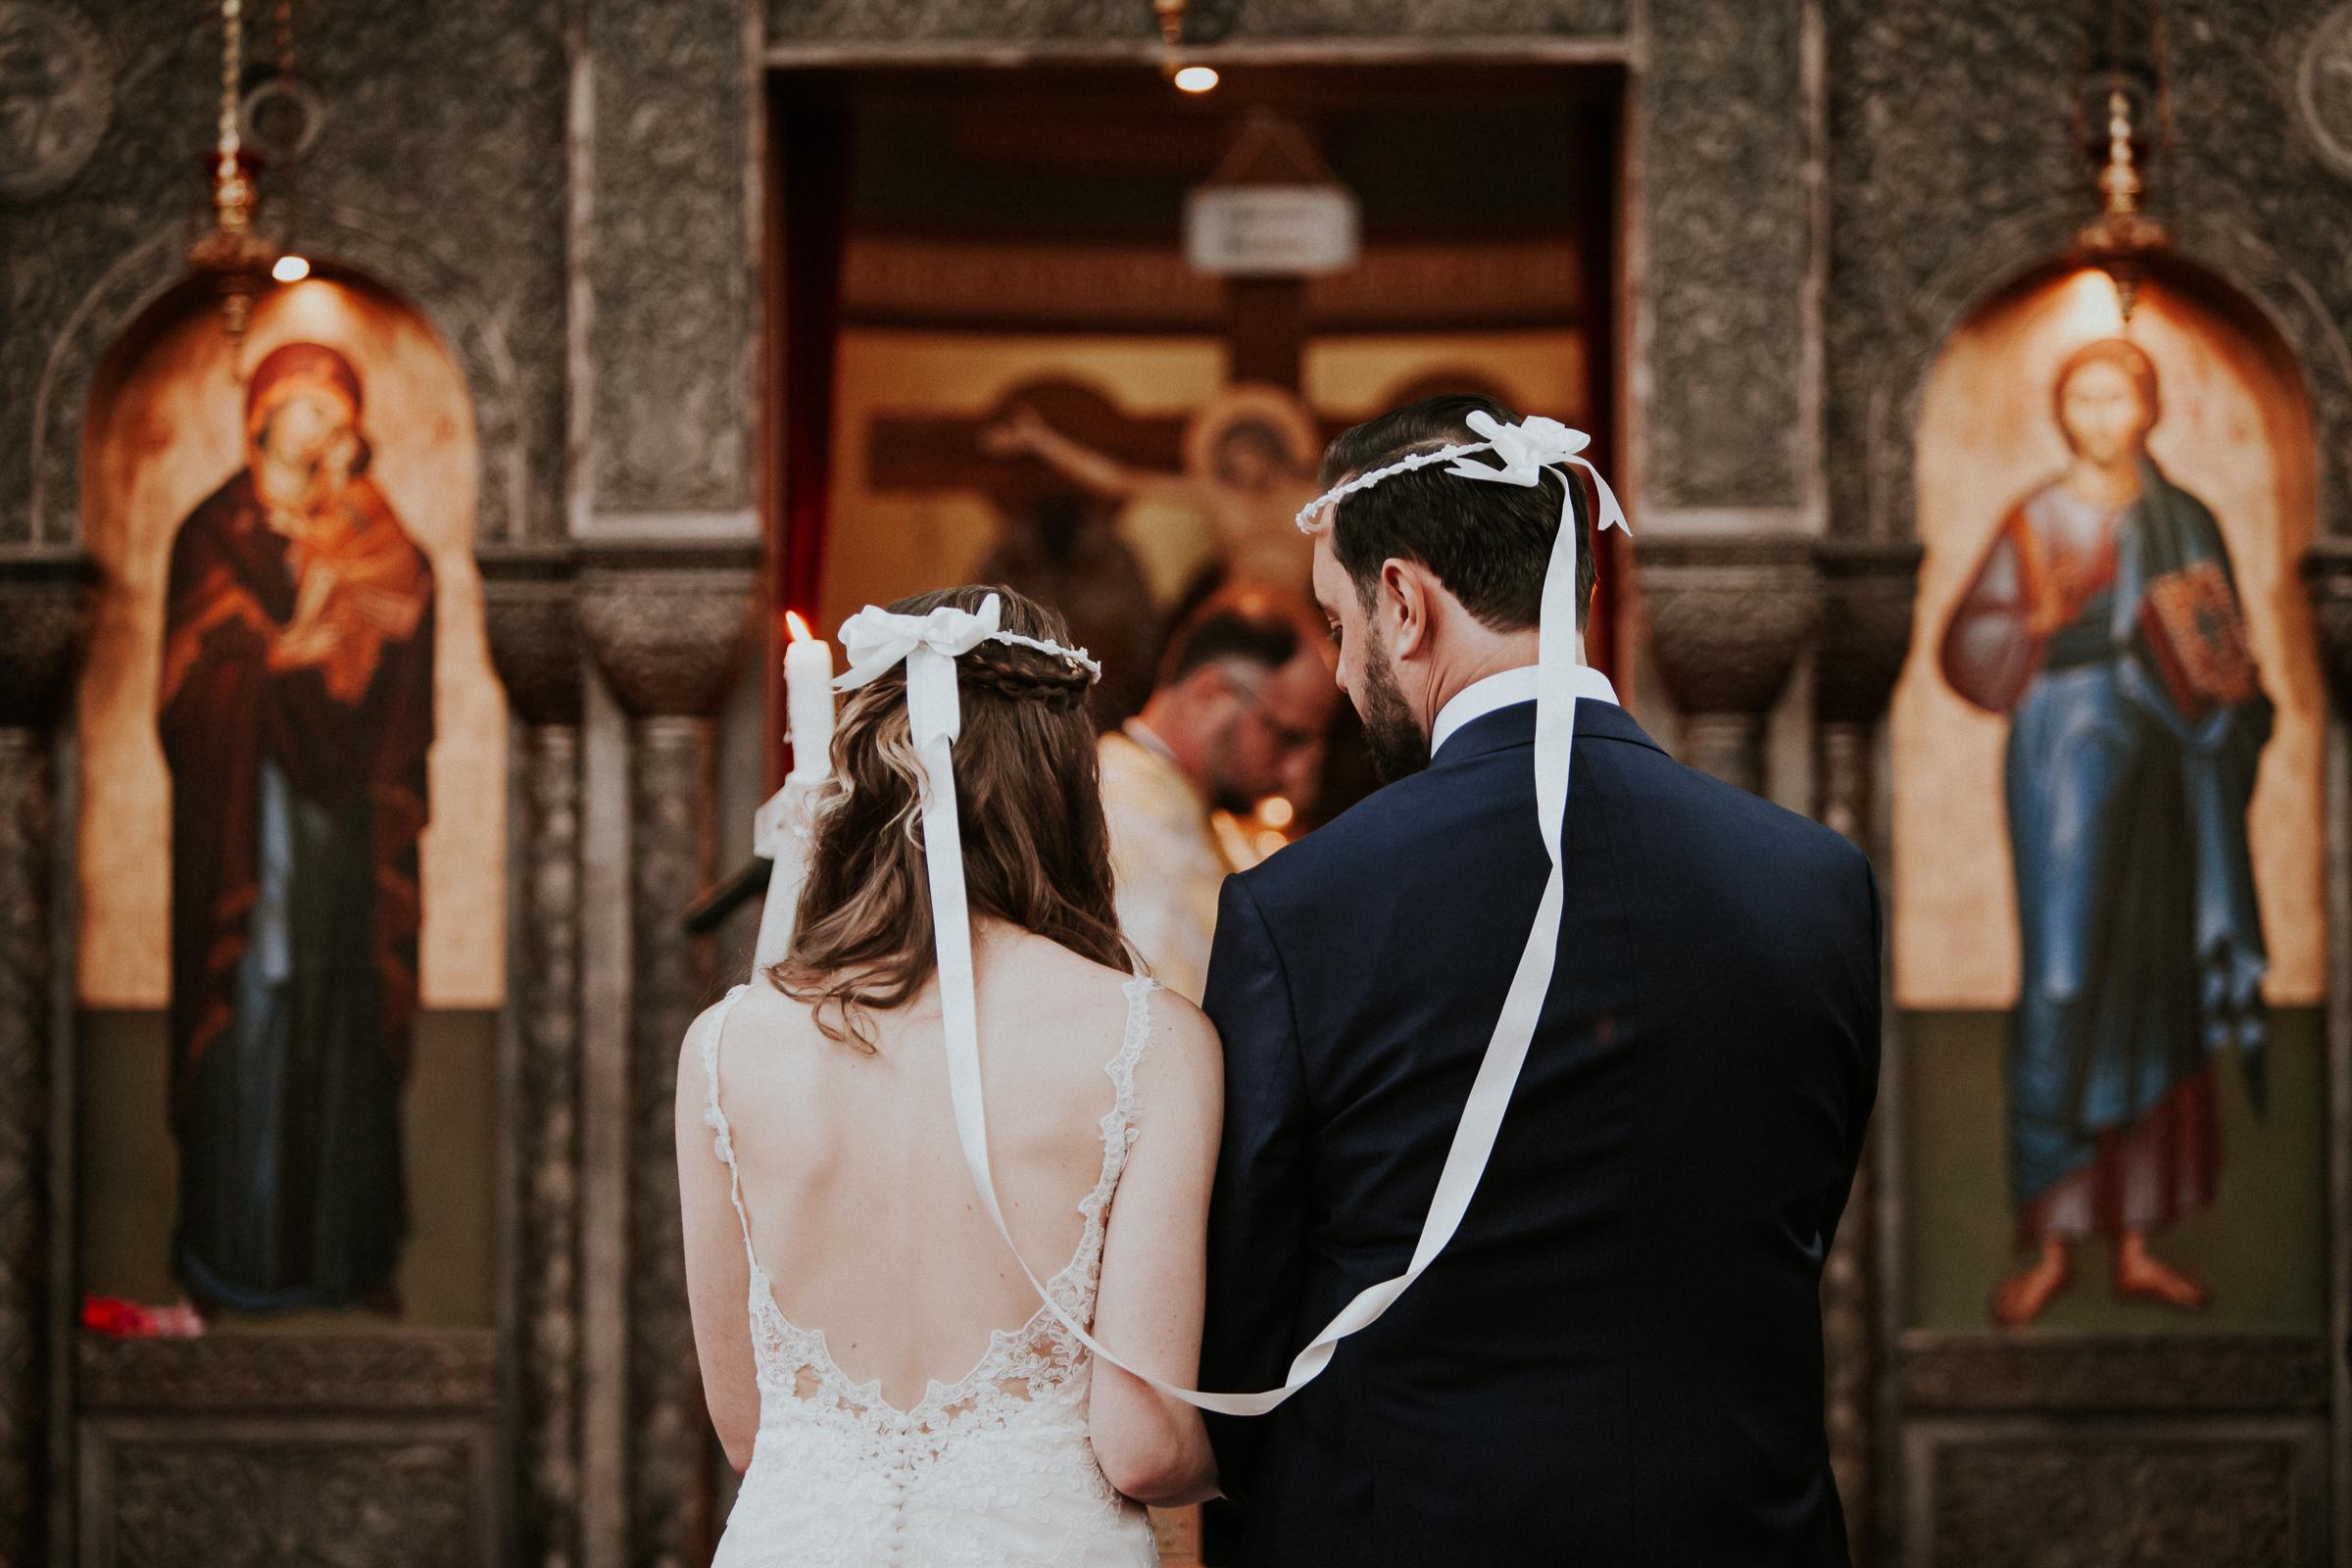 New-York-Documentary-Wedding-Photography-Best-Of-2017-by-Elvira-Kalviste-Photography-97.jpg